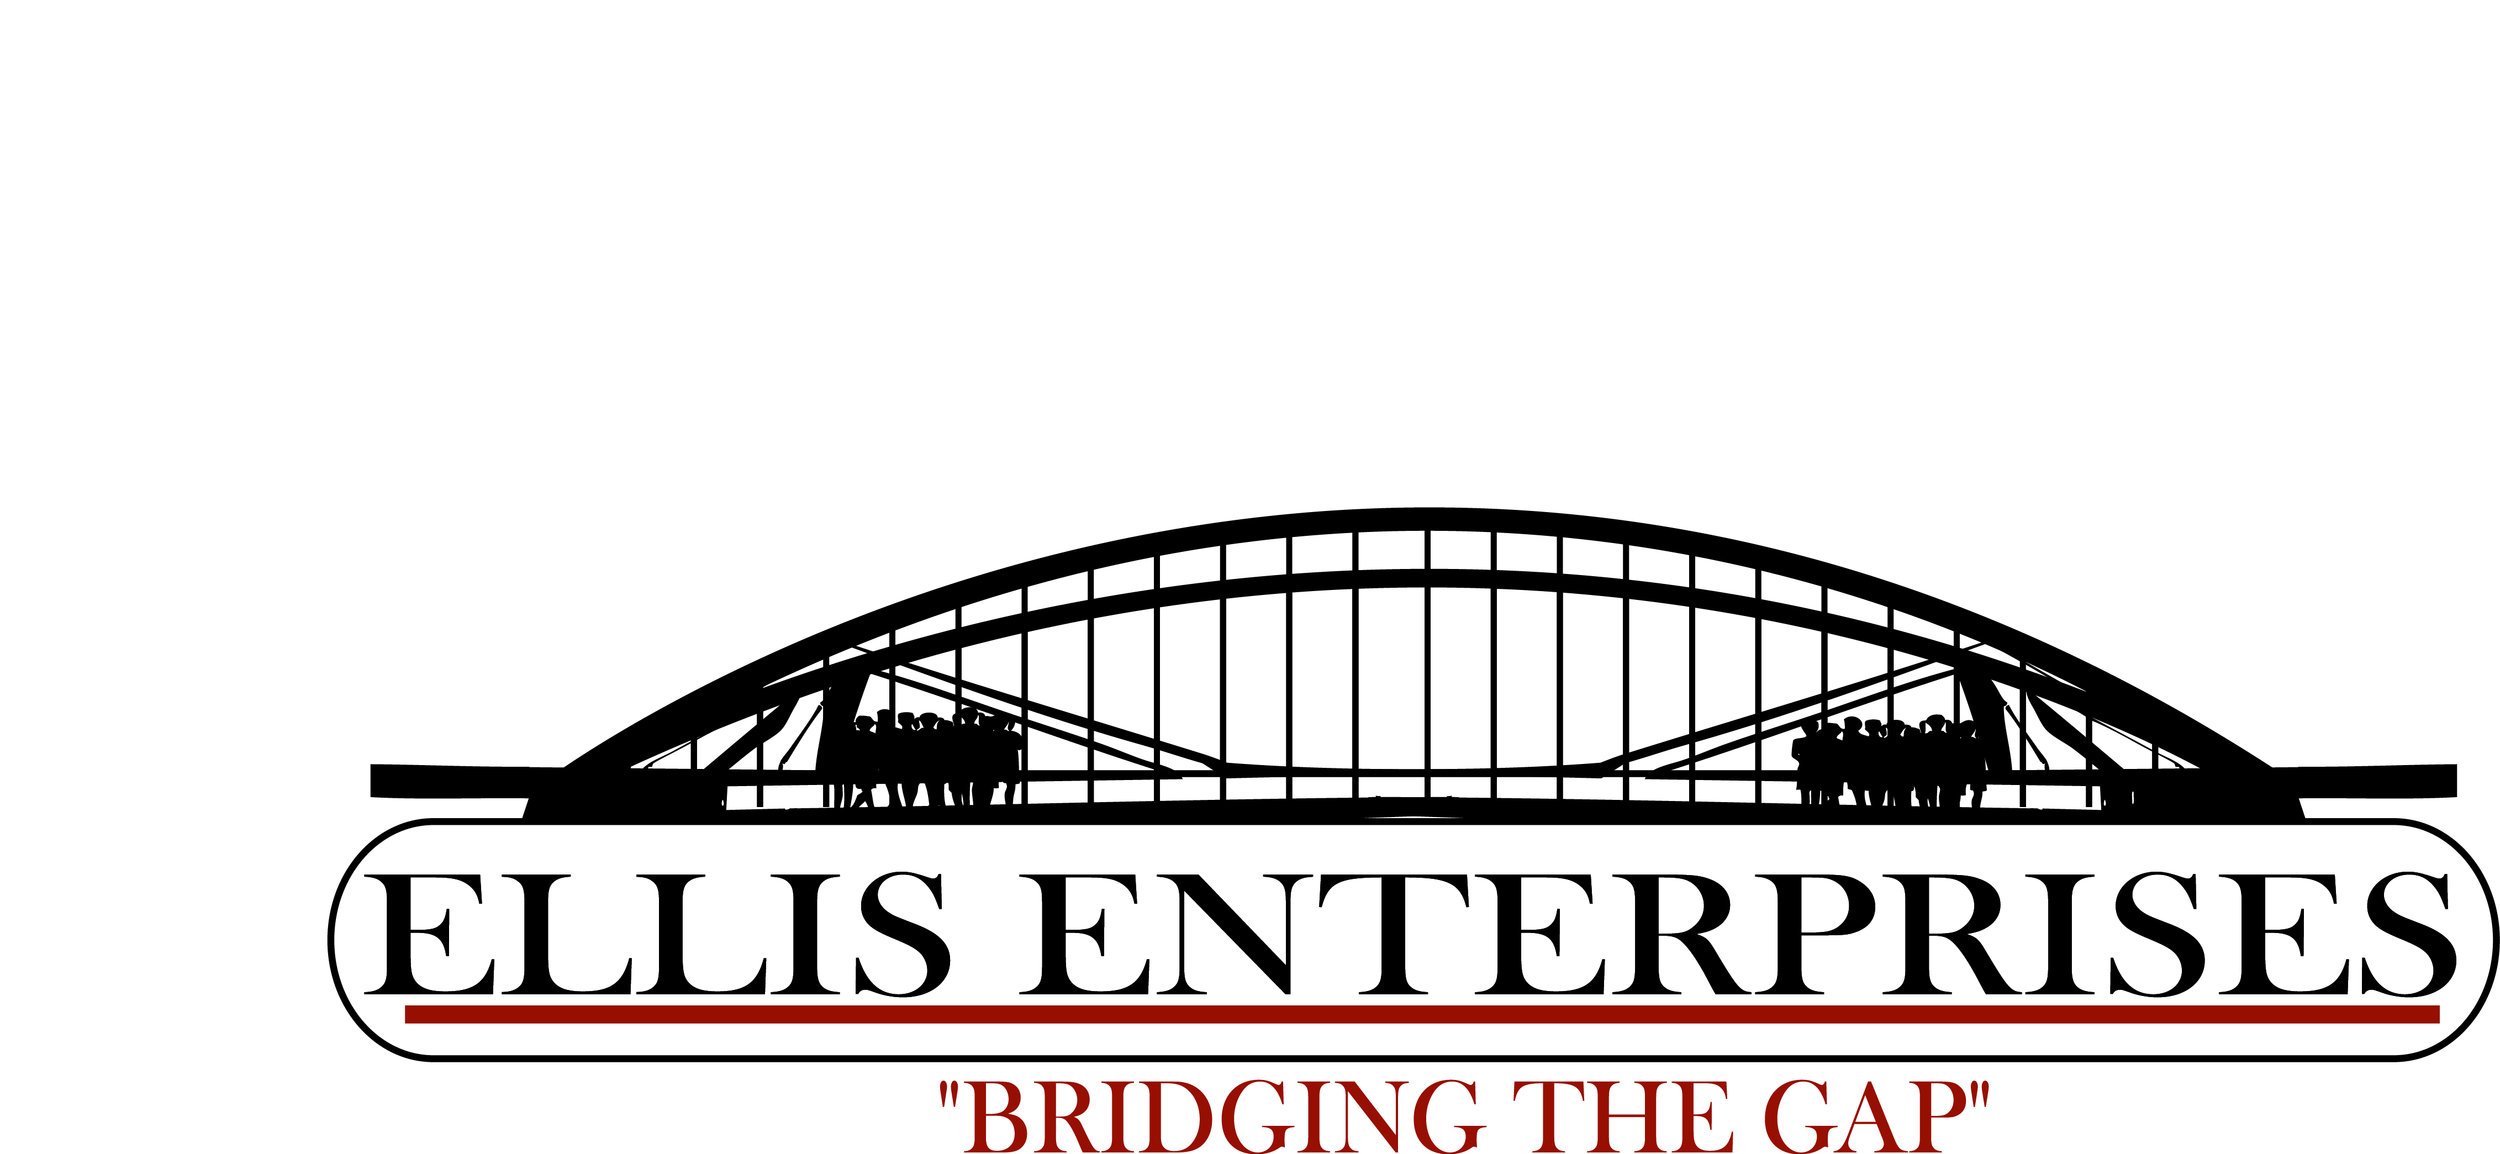 Ellis Enterprises